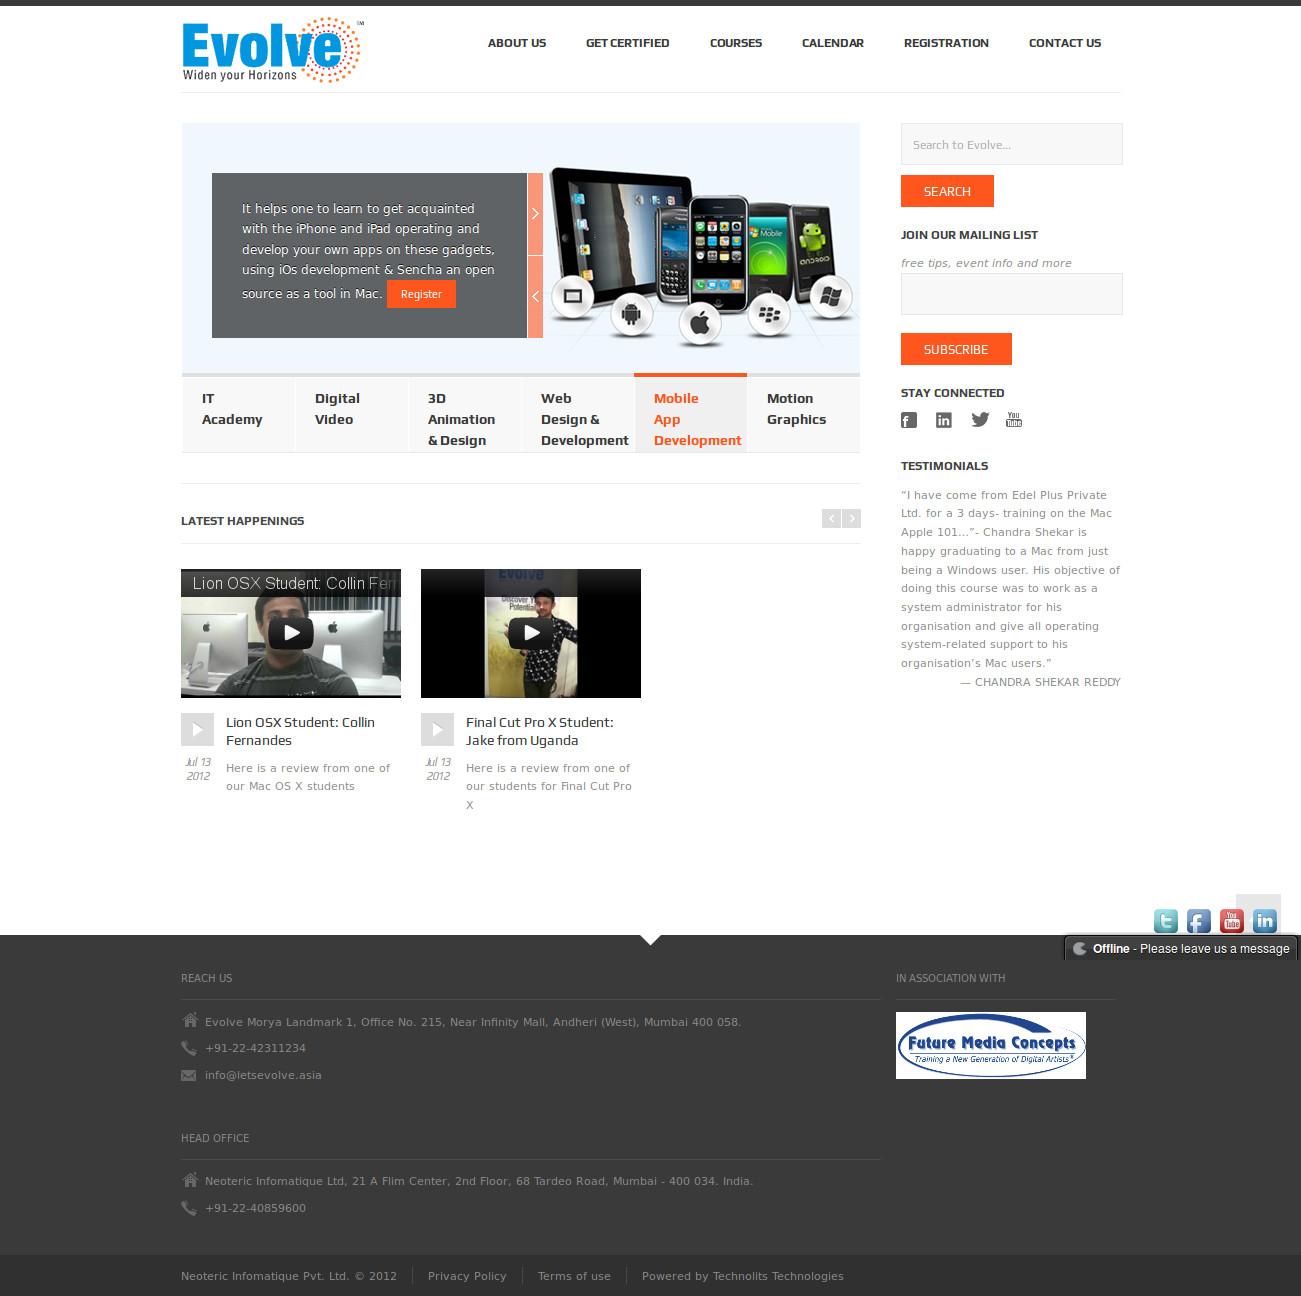 letsevolve full page